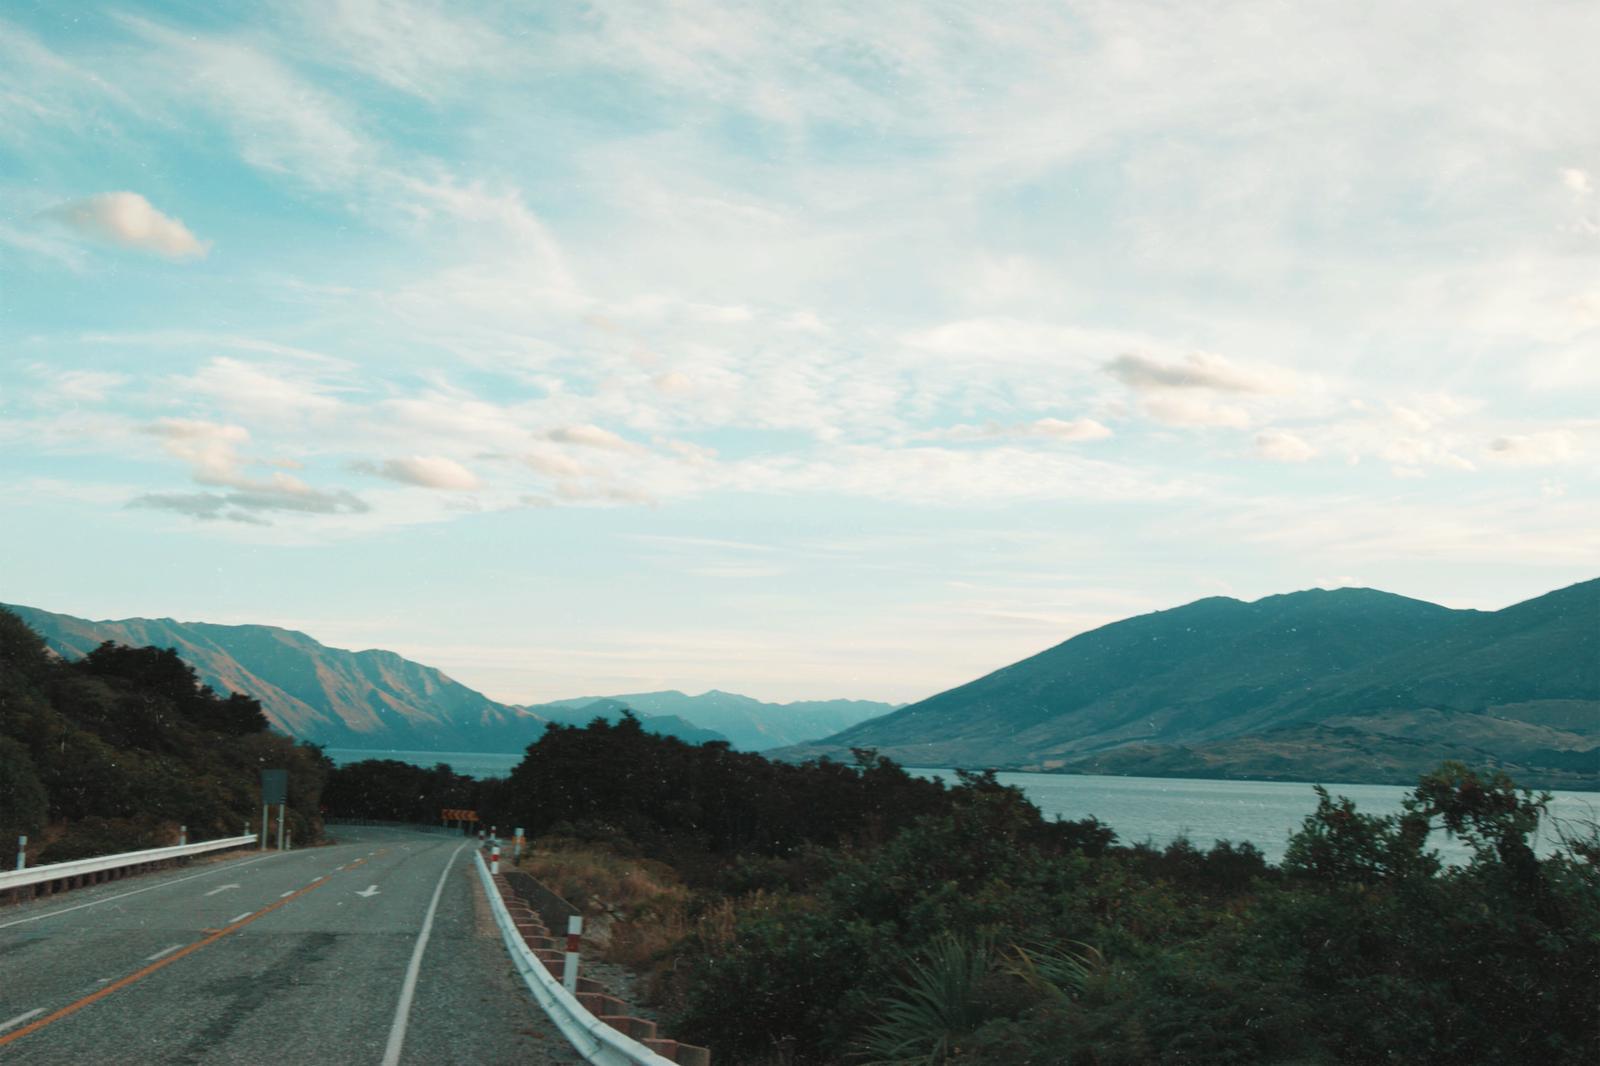 Work and Travel – Warum Neuseeland?